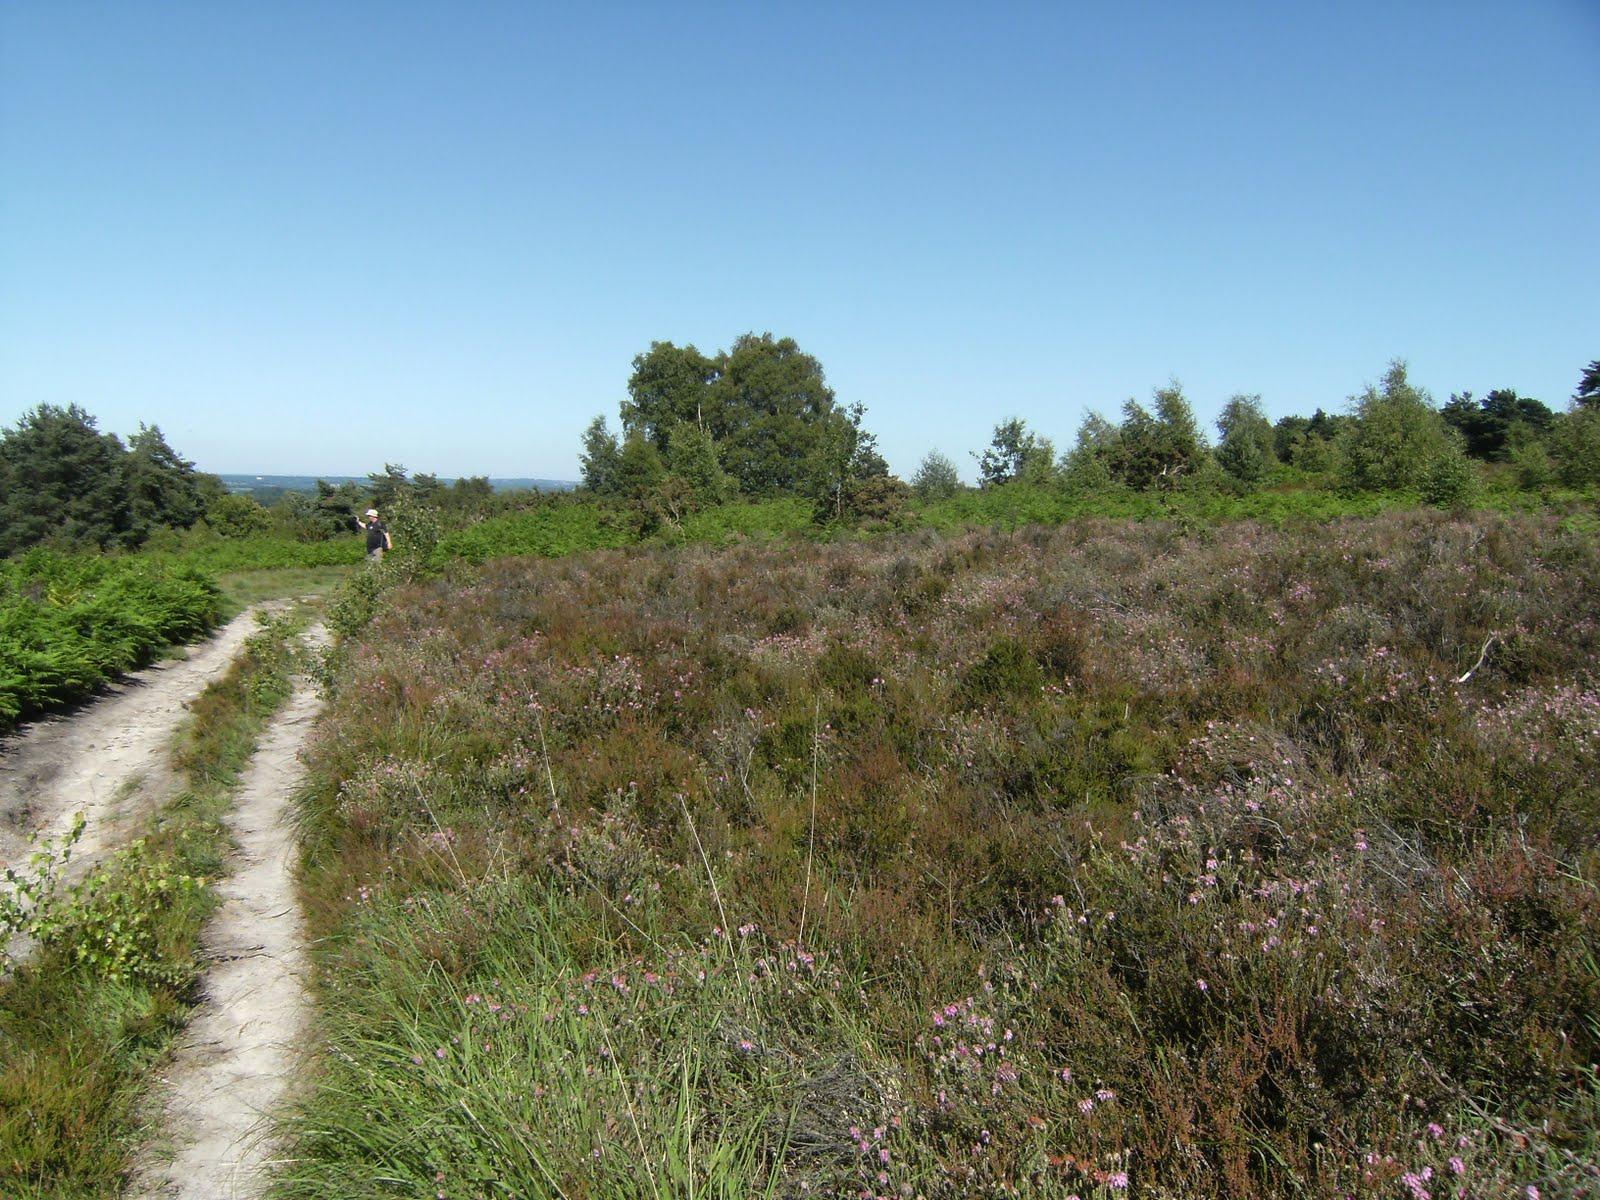 DSCF8742 Summer heather on Ashdown Forest